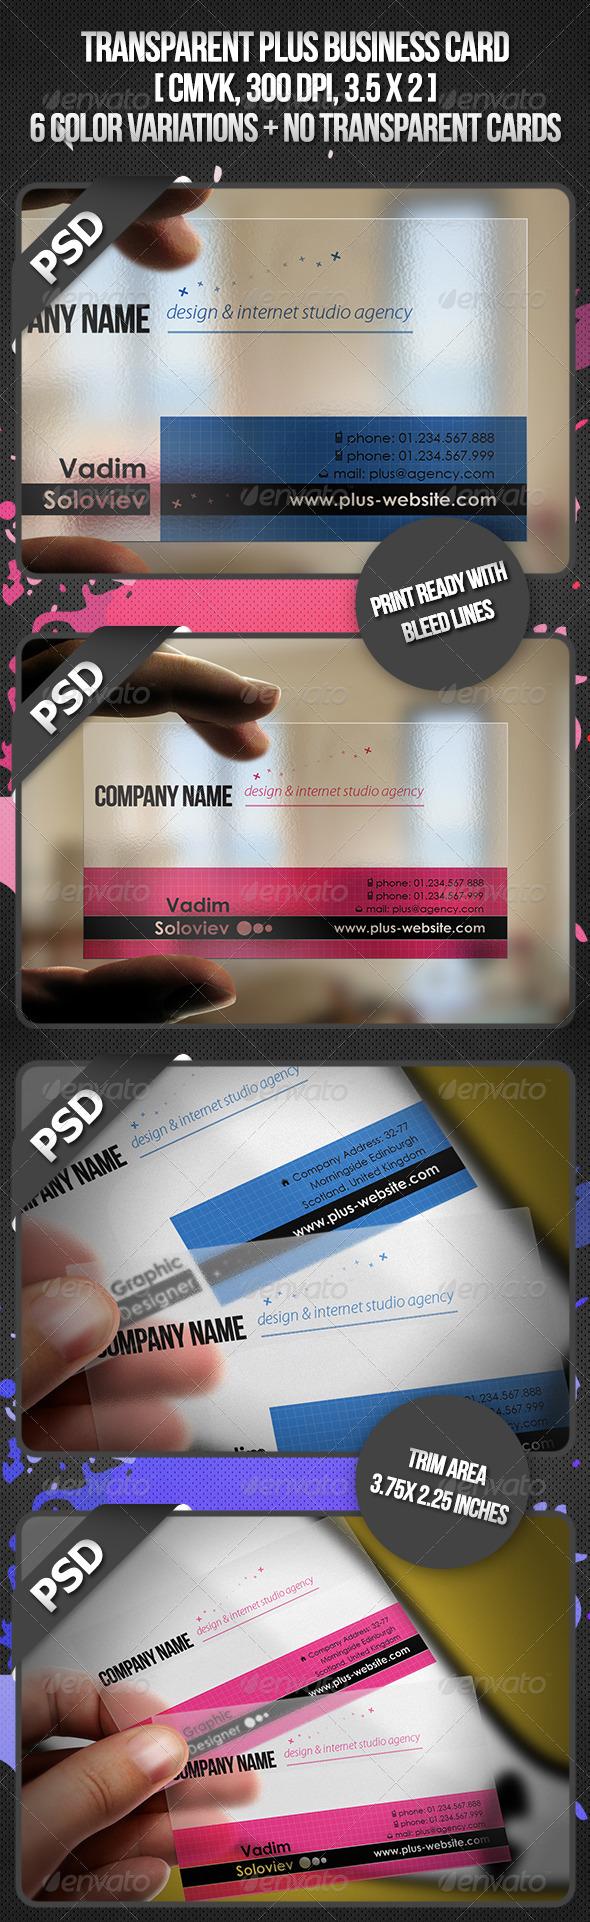 GraphicRiver Transparent Plus Business Card 3582222